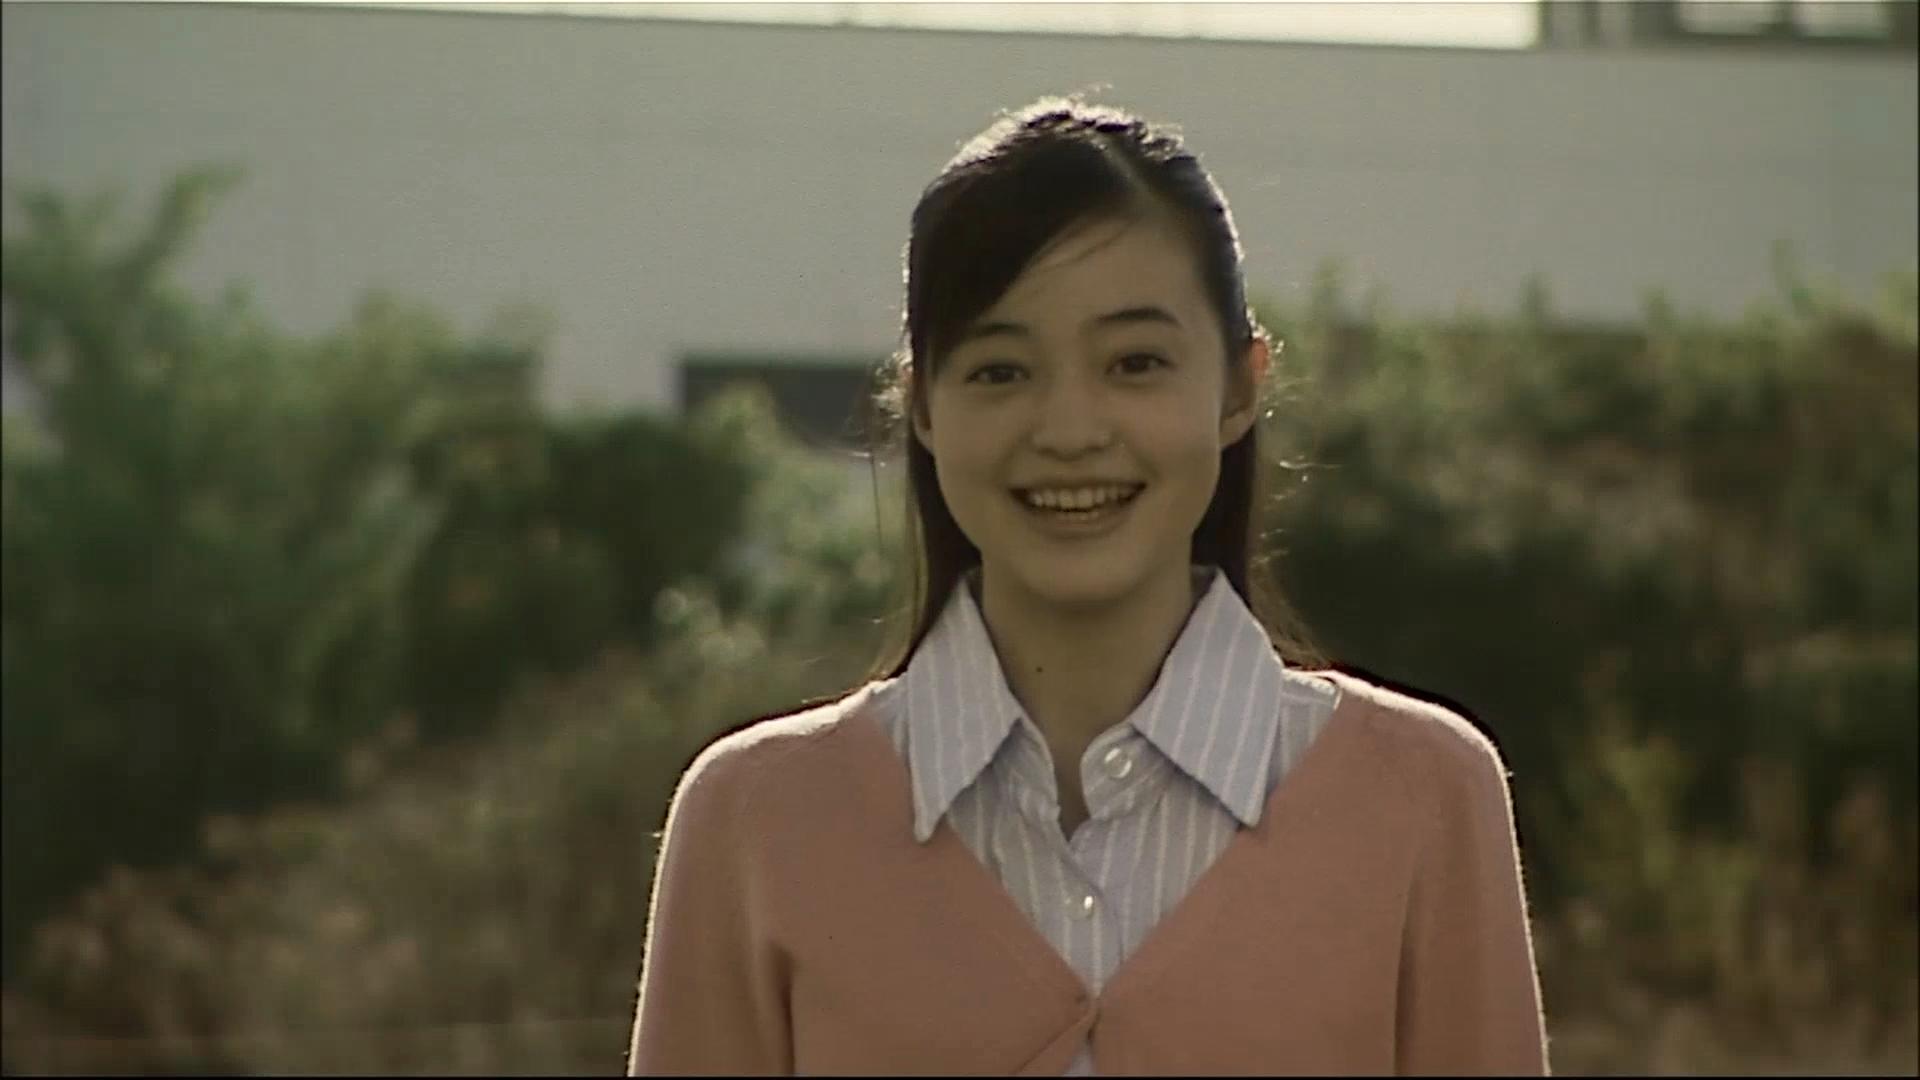 Miyoko Harada